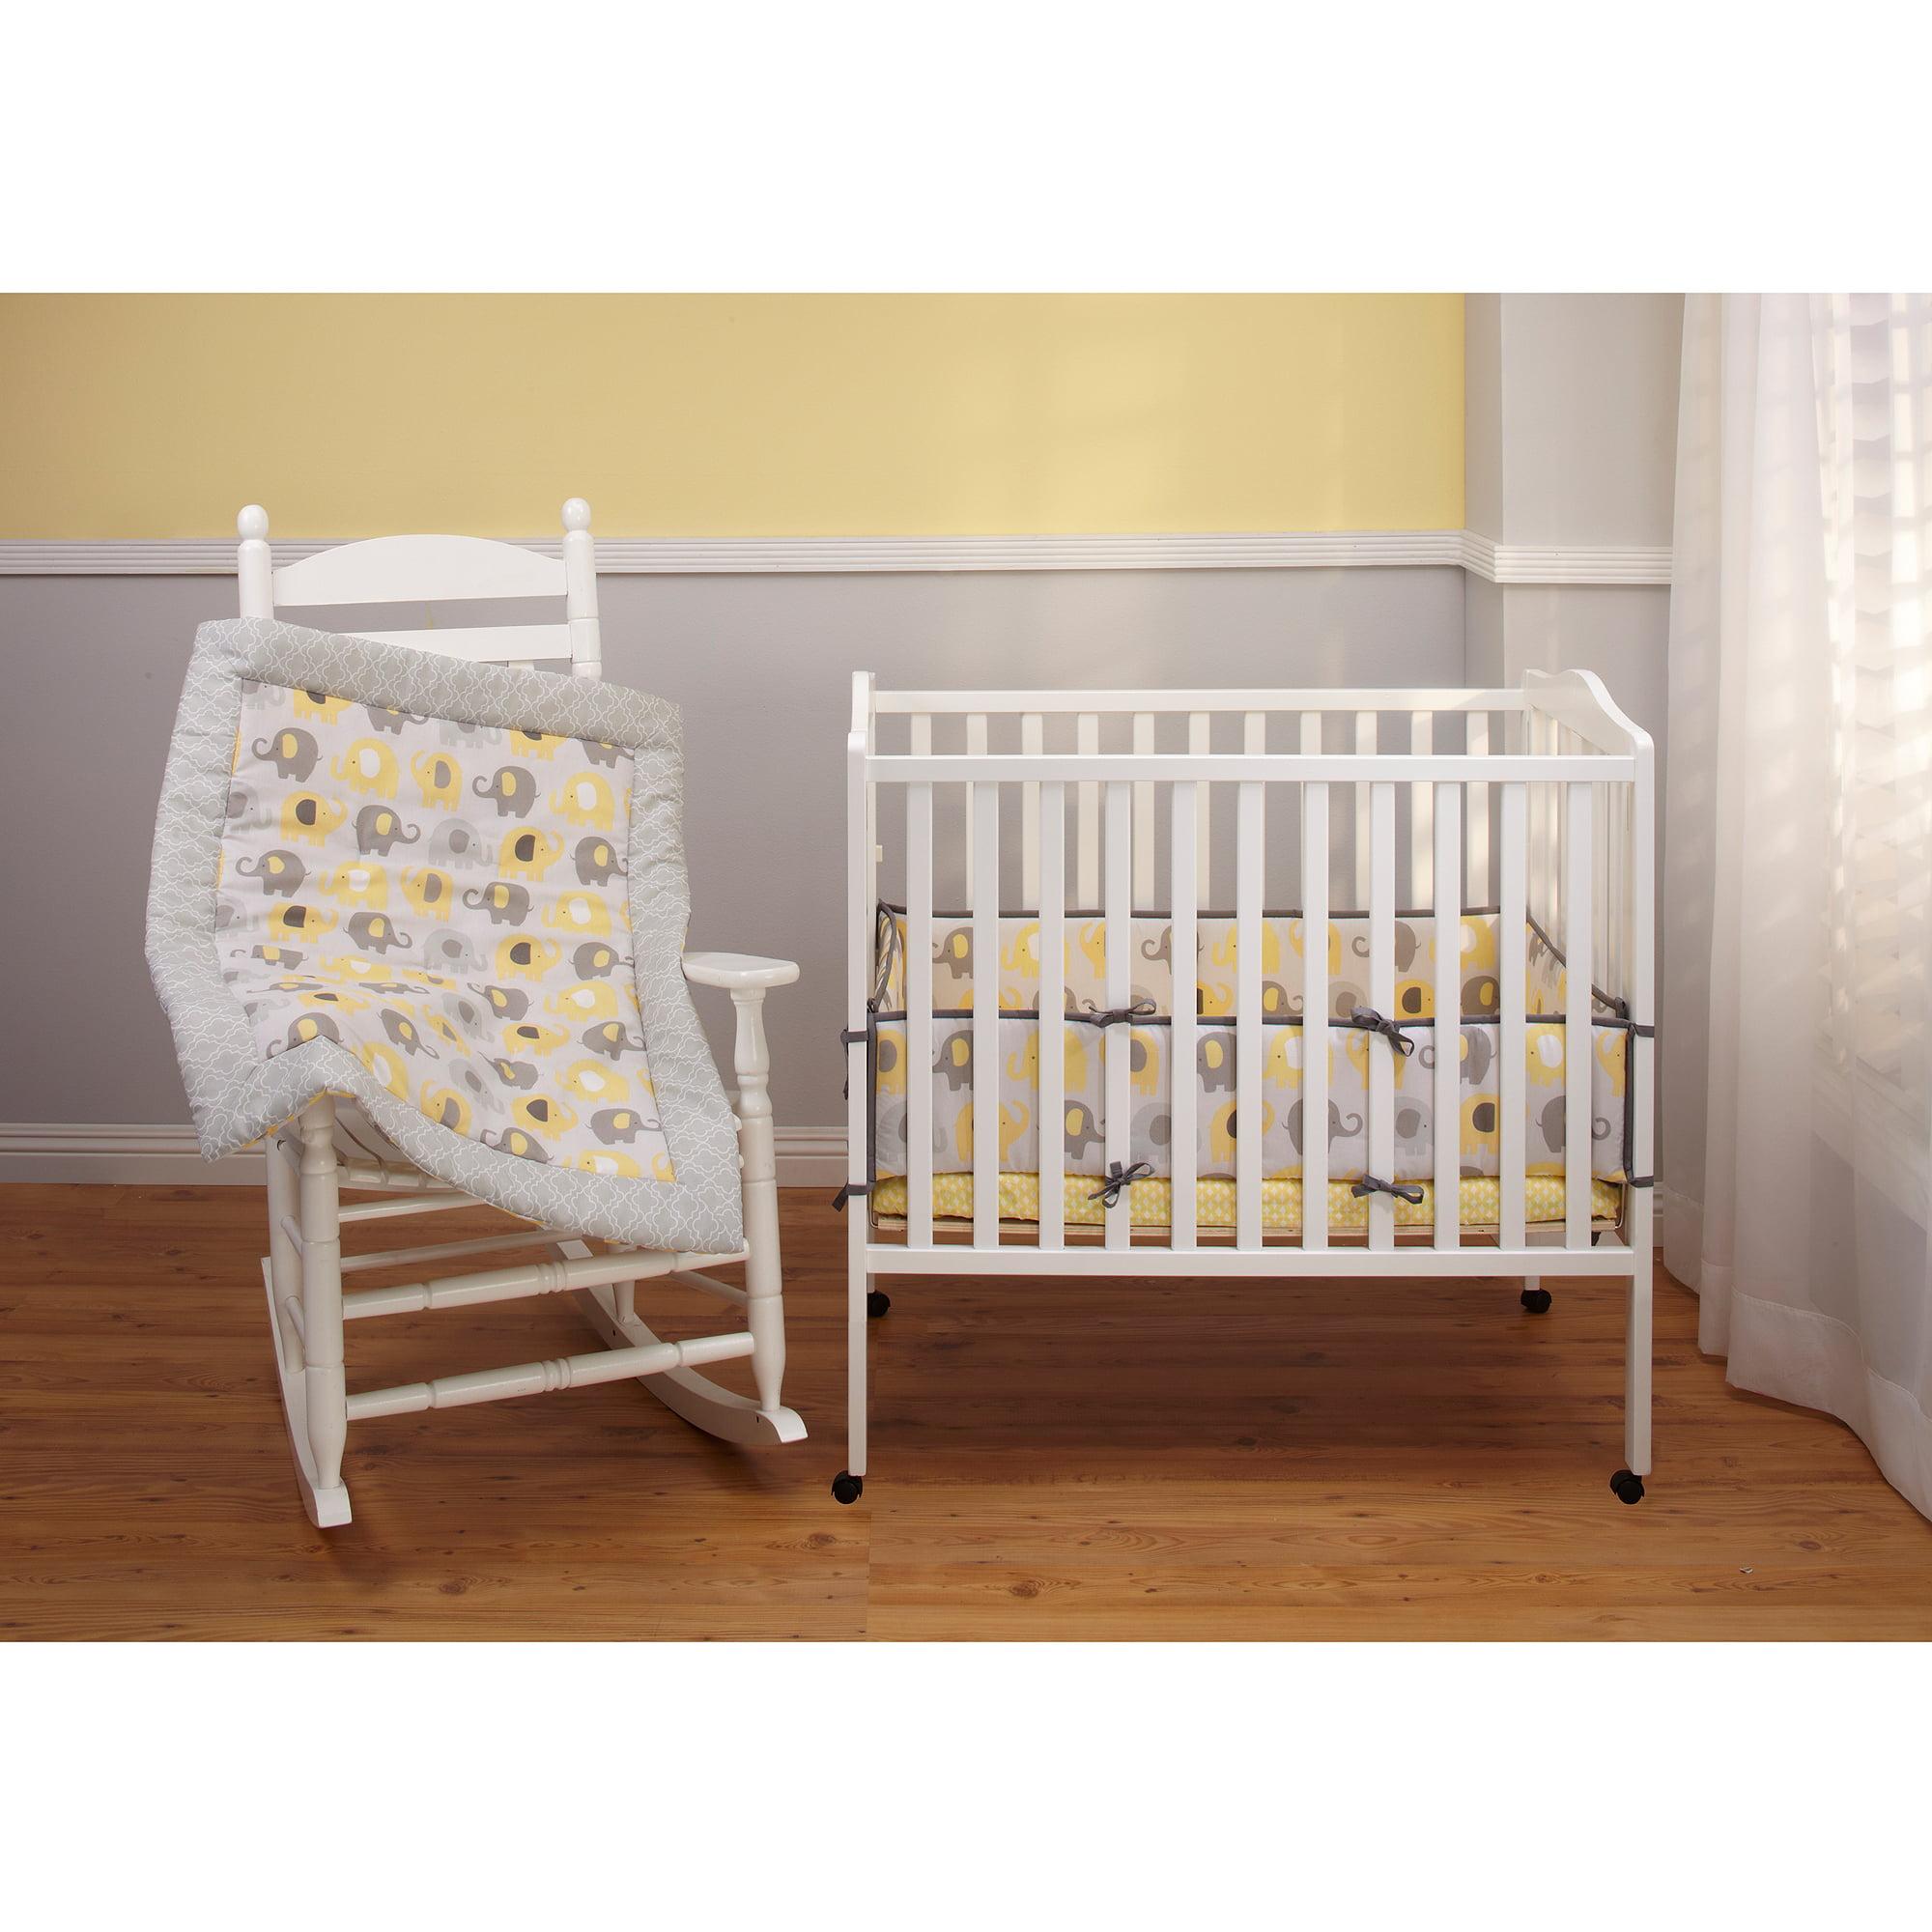 Portable Crib Little Bedding By Nojo Elephant Time Portable Crib Bumper  Yellow . Portable Crib ...